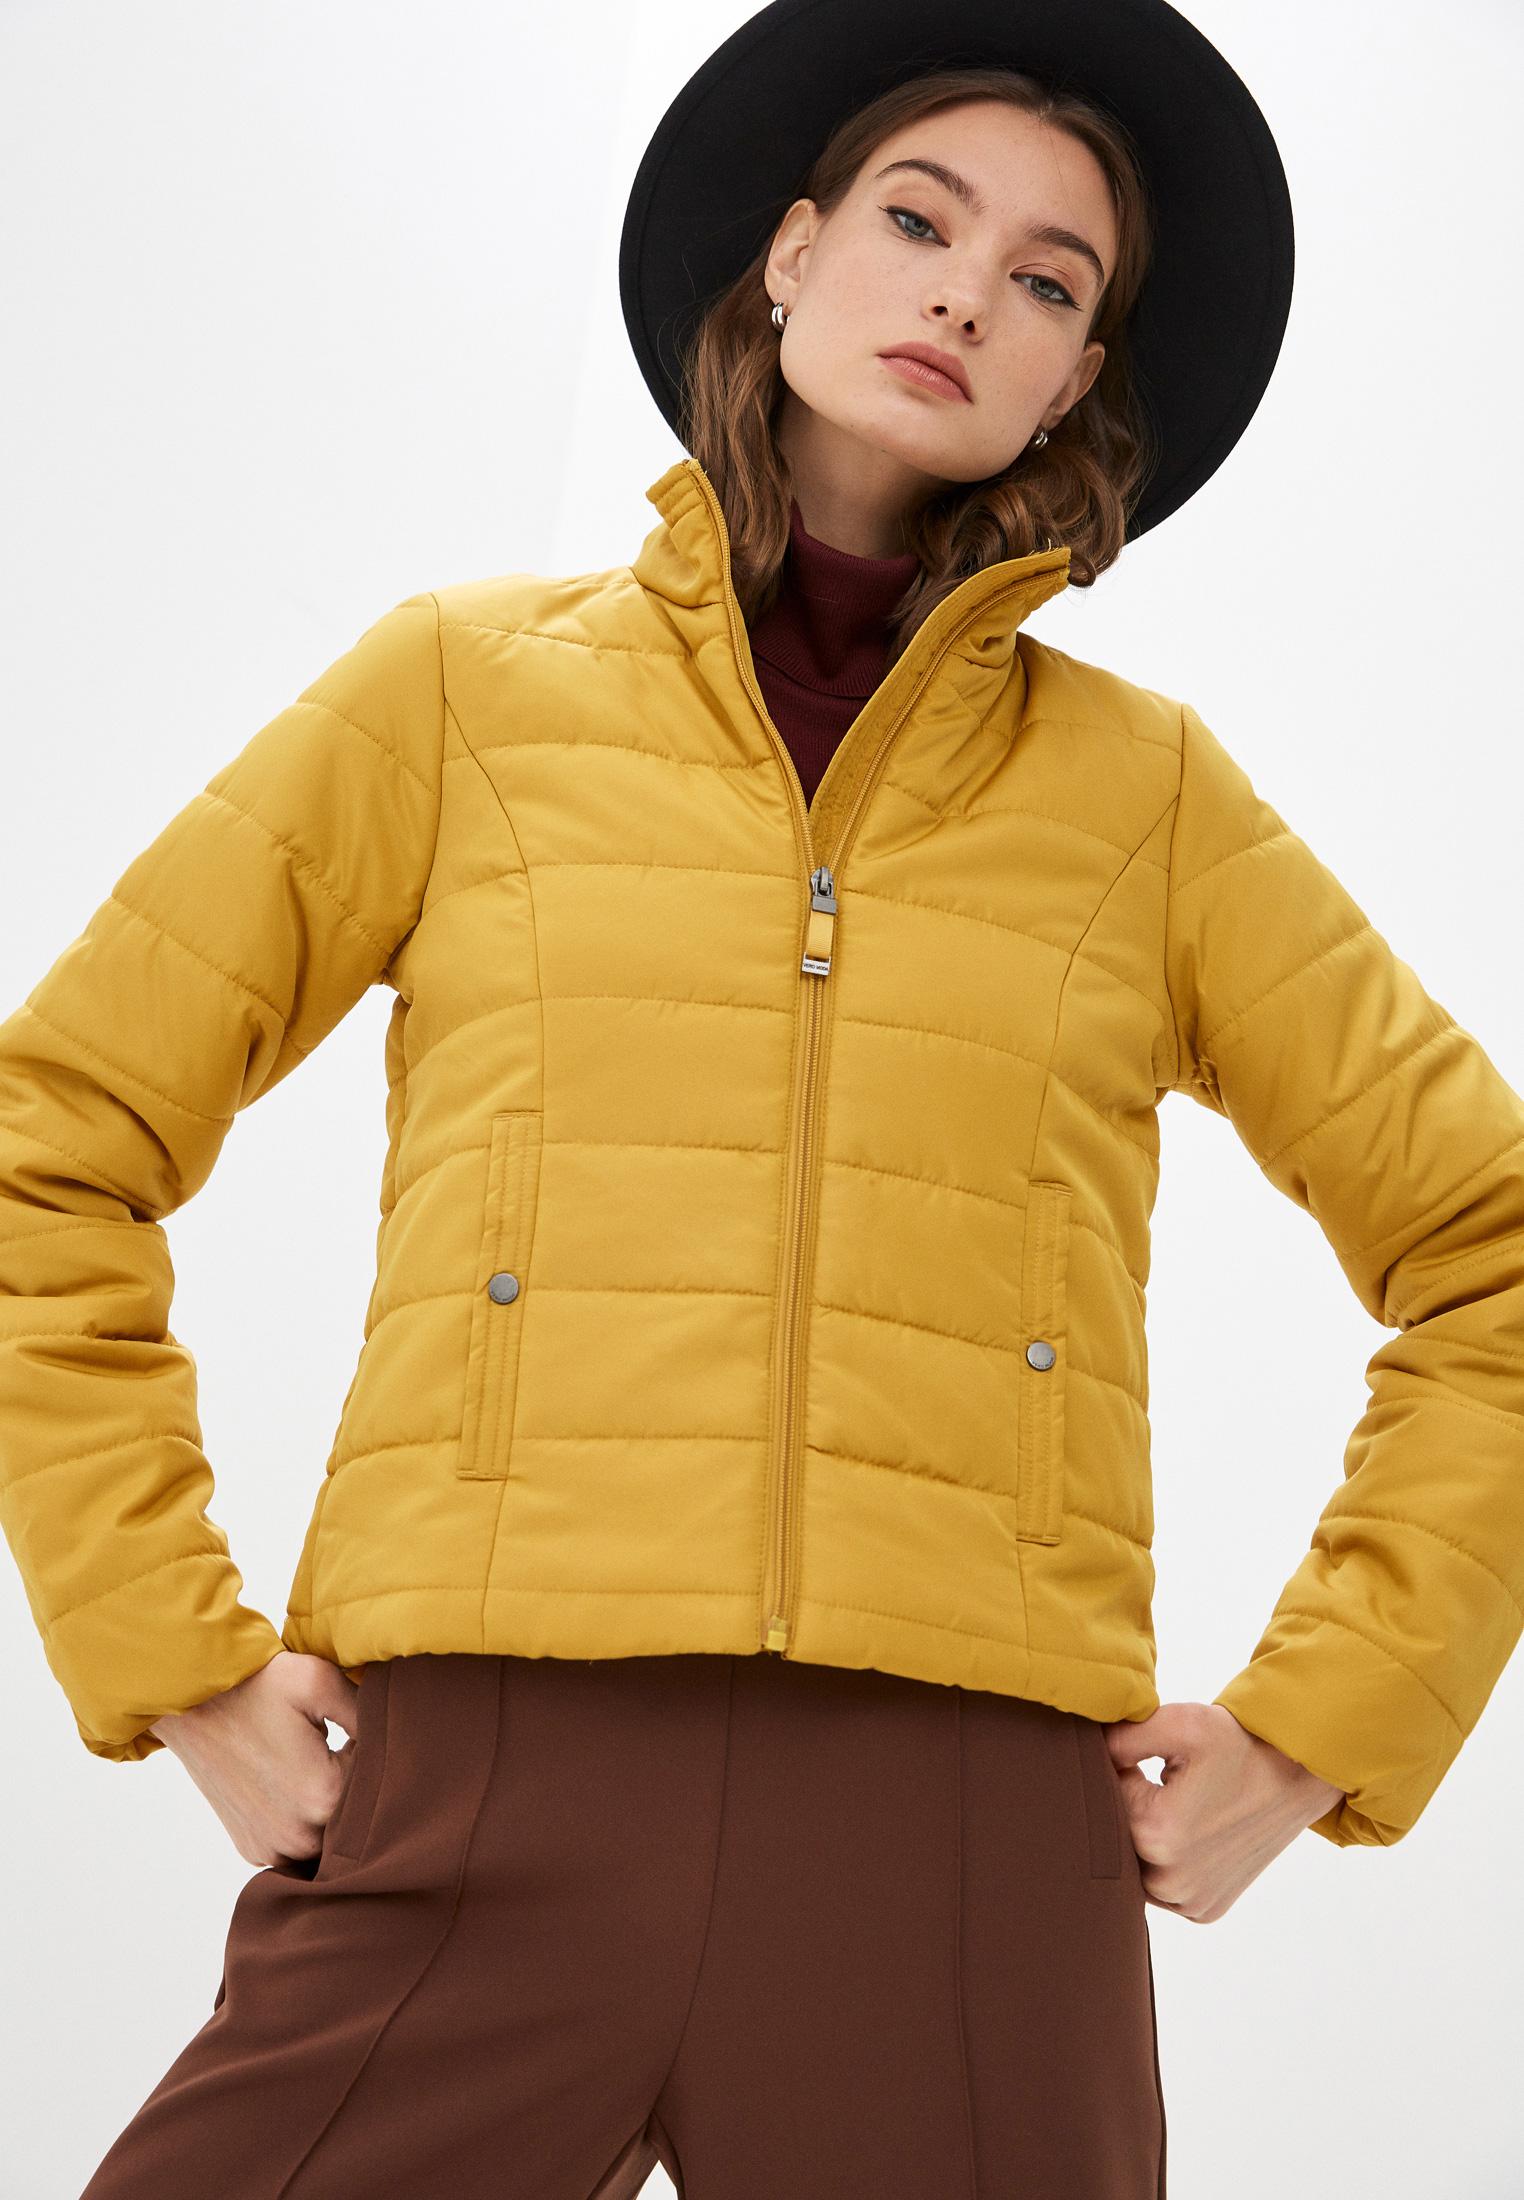 Утепленная куртка Vero Moda Куртка утепленная Vero Moda